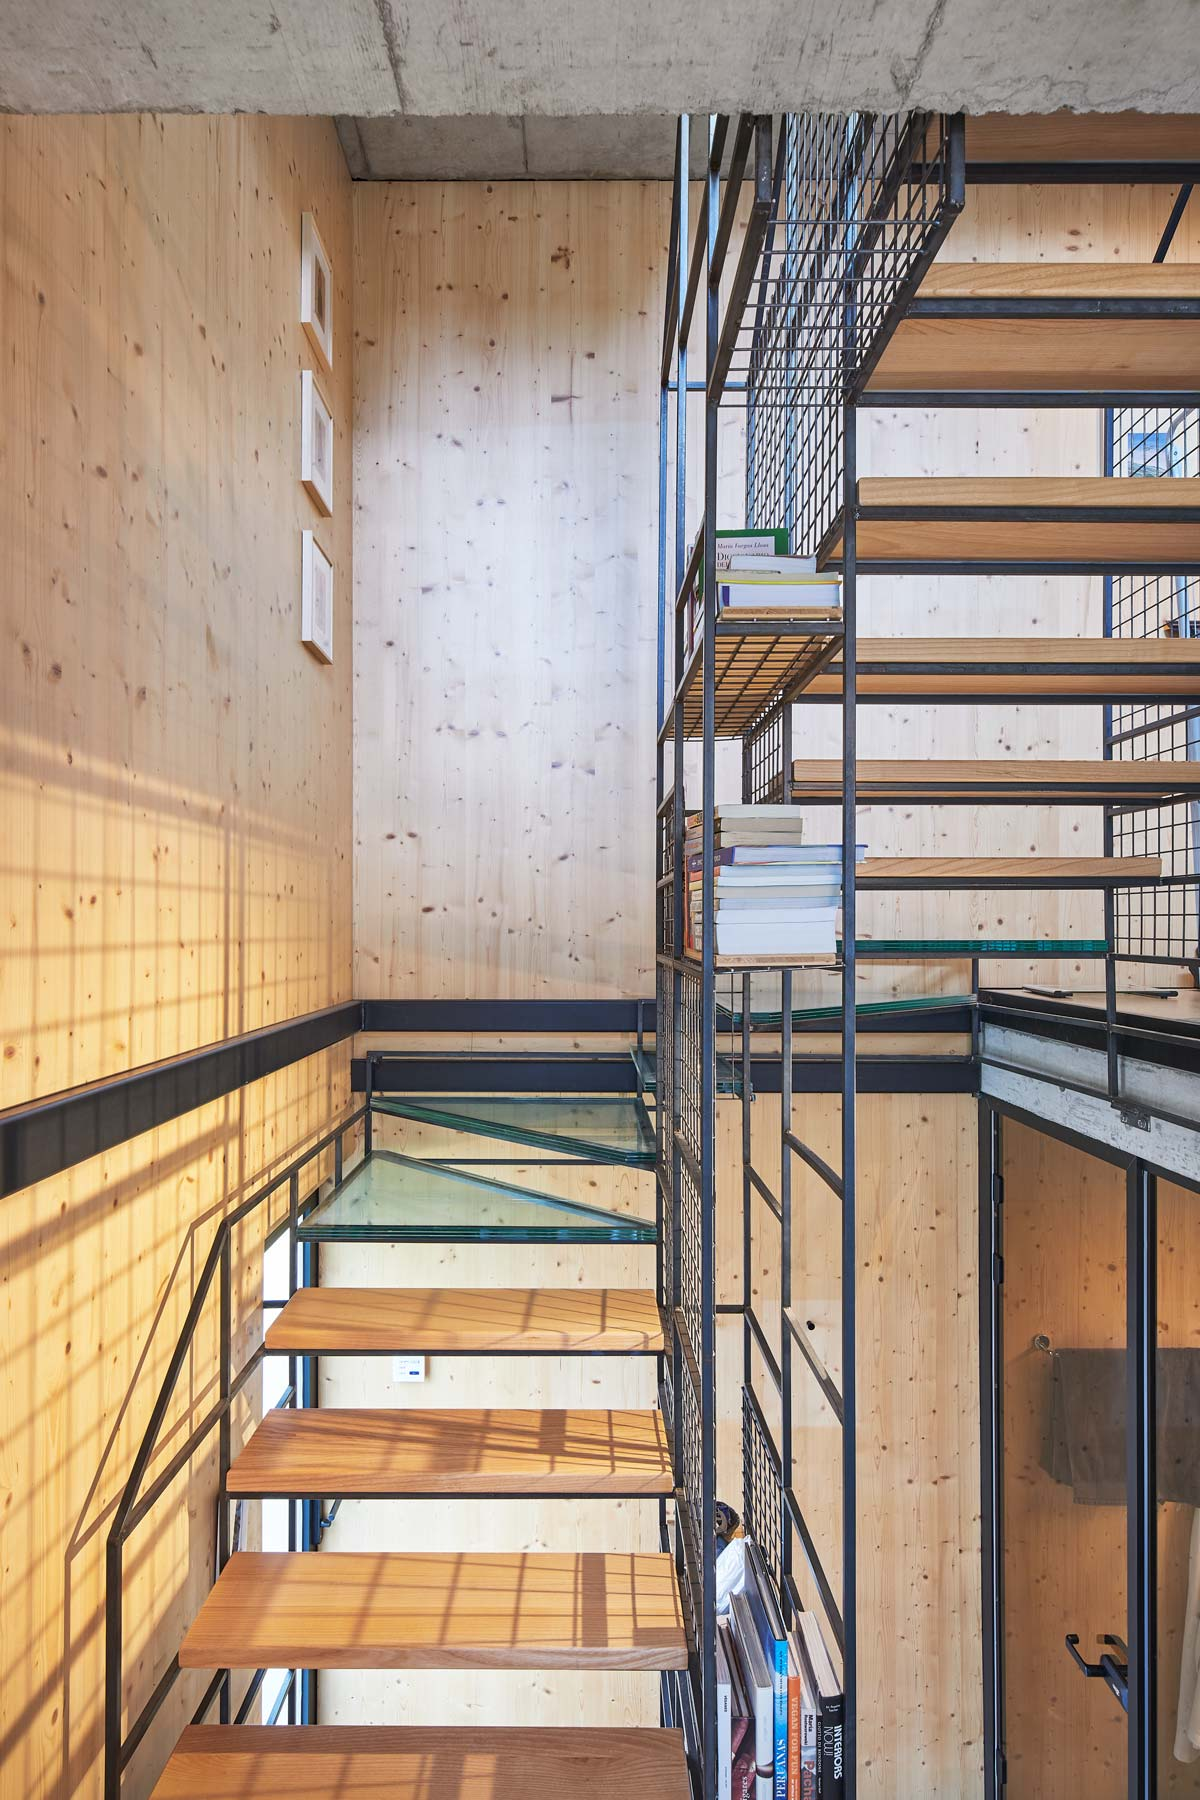 Treppenhaus aus Holz